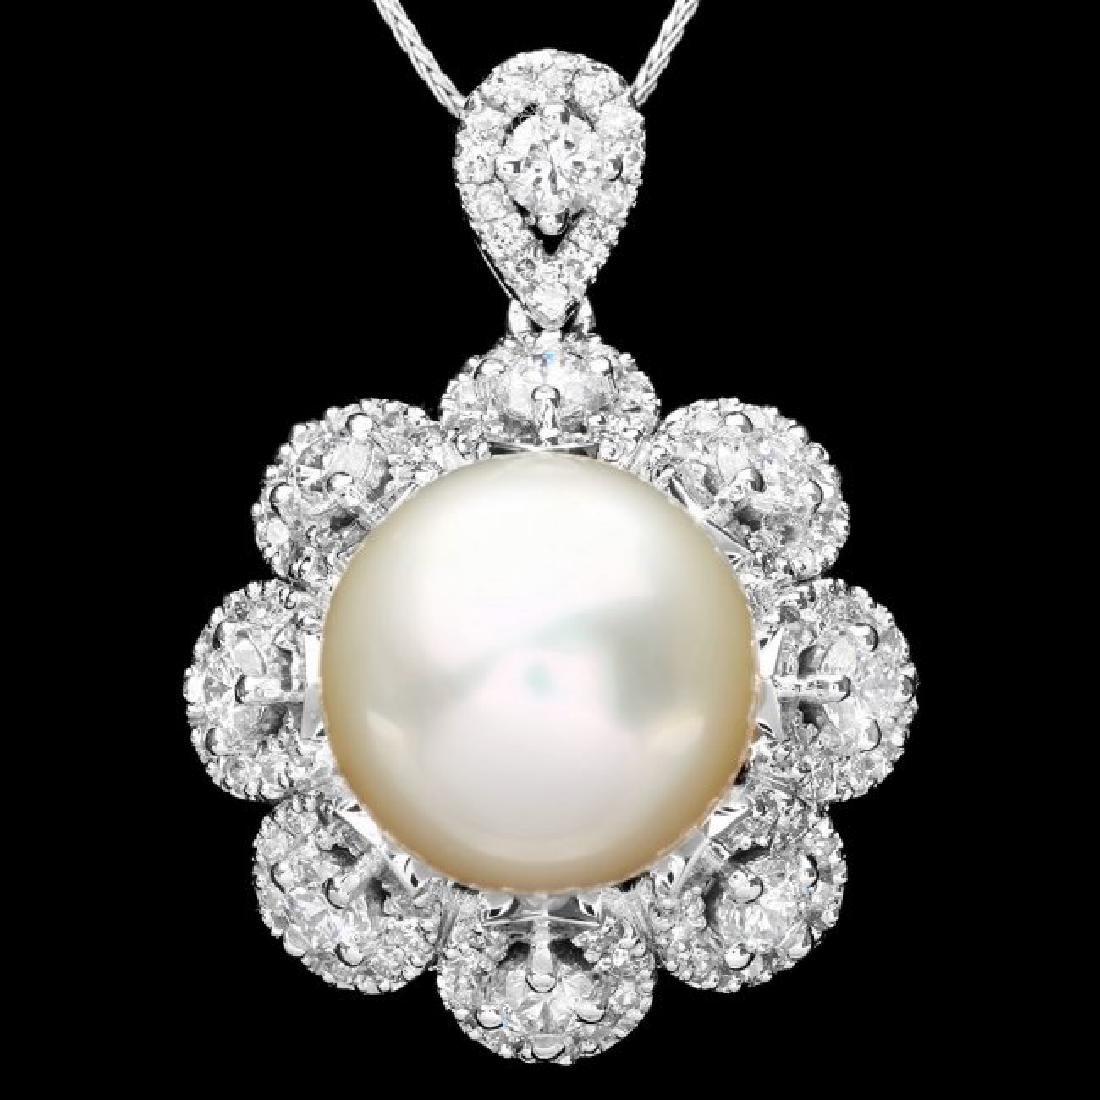 14k Gold 14 X 14mm Pearl 3ct Diamond Pendant